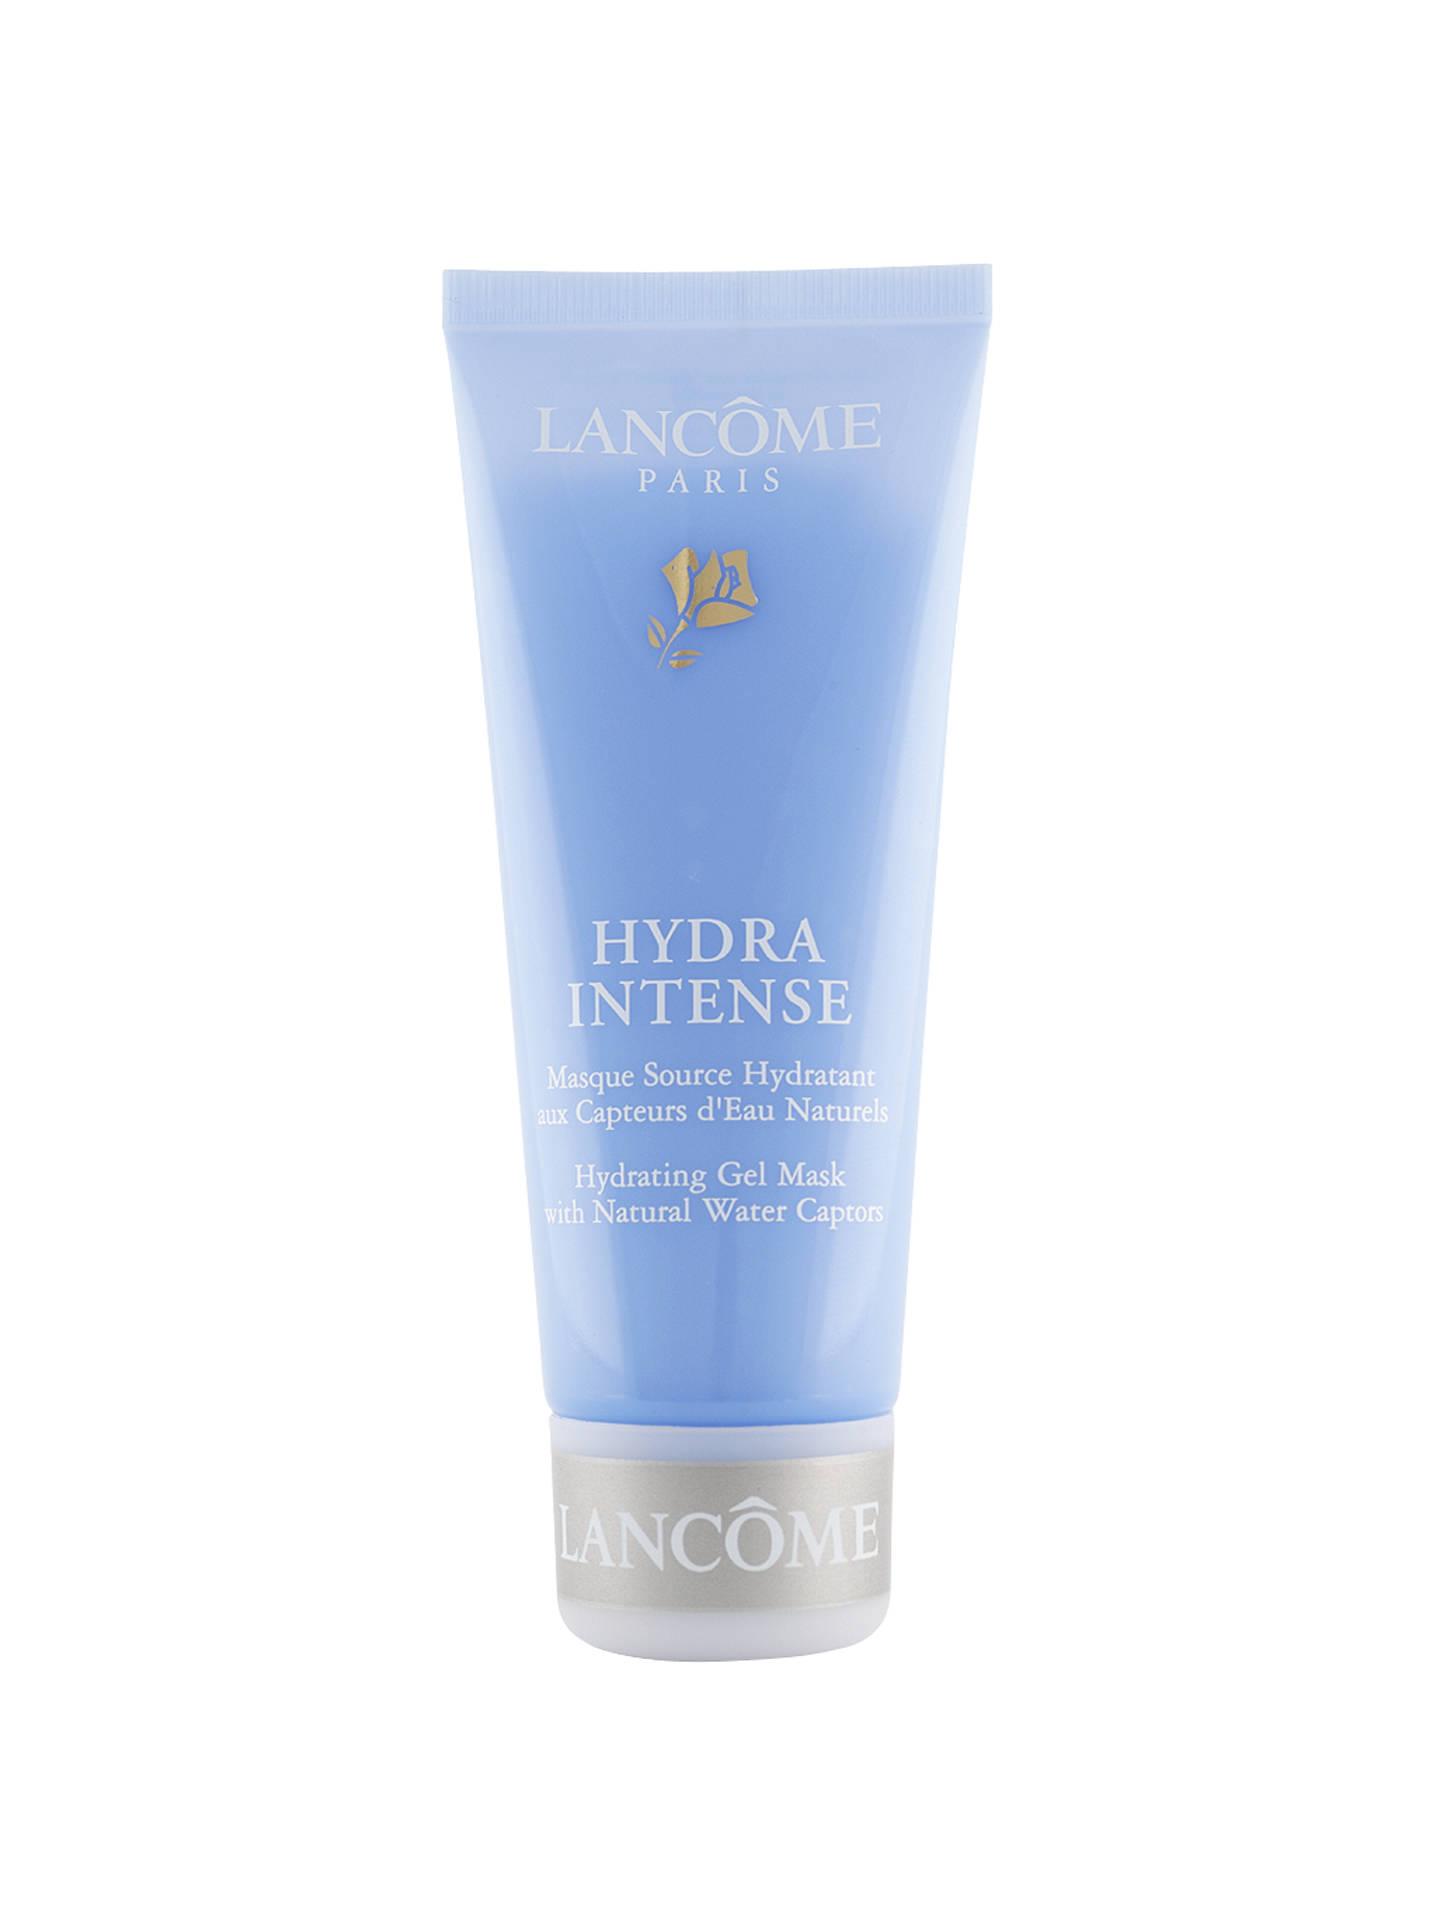 hydra intense masque lancome review